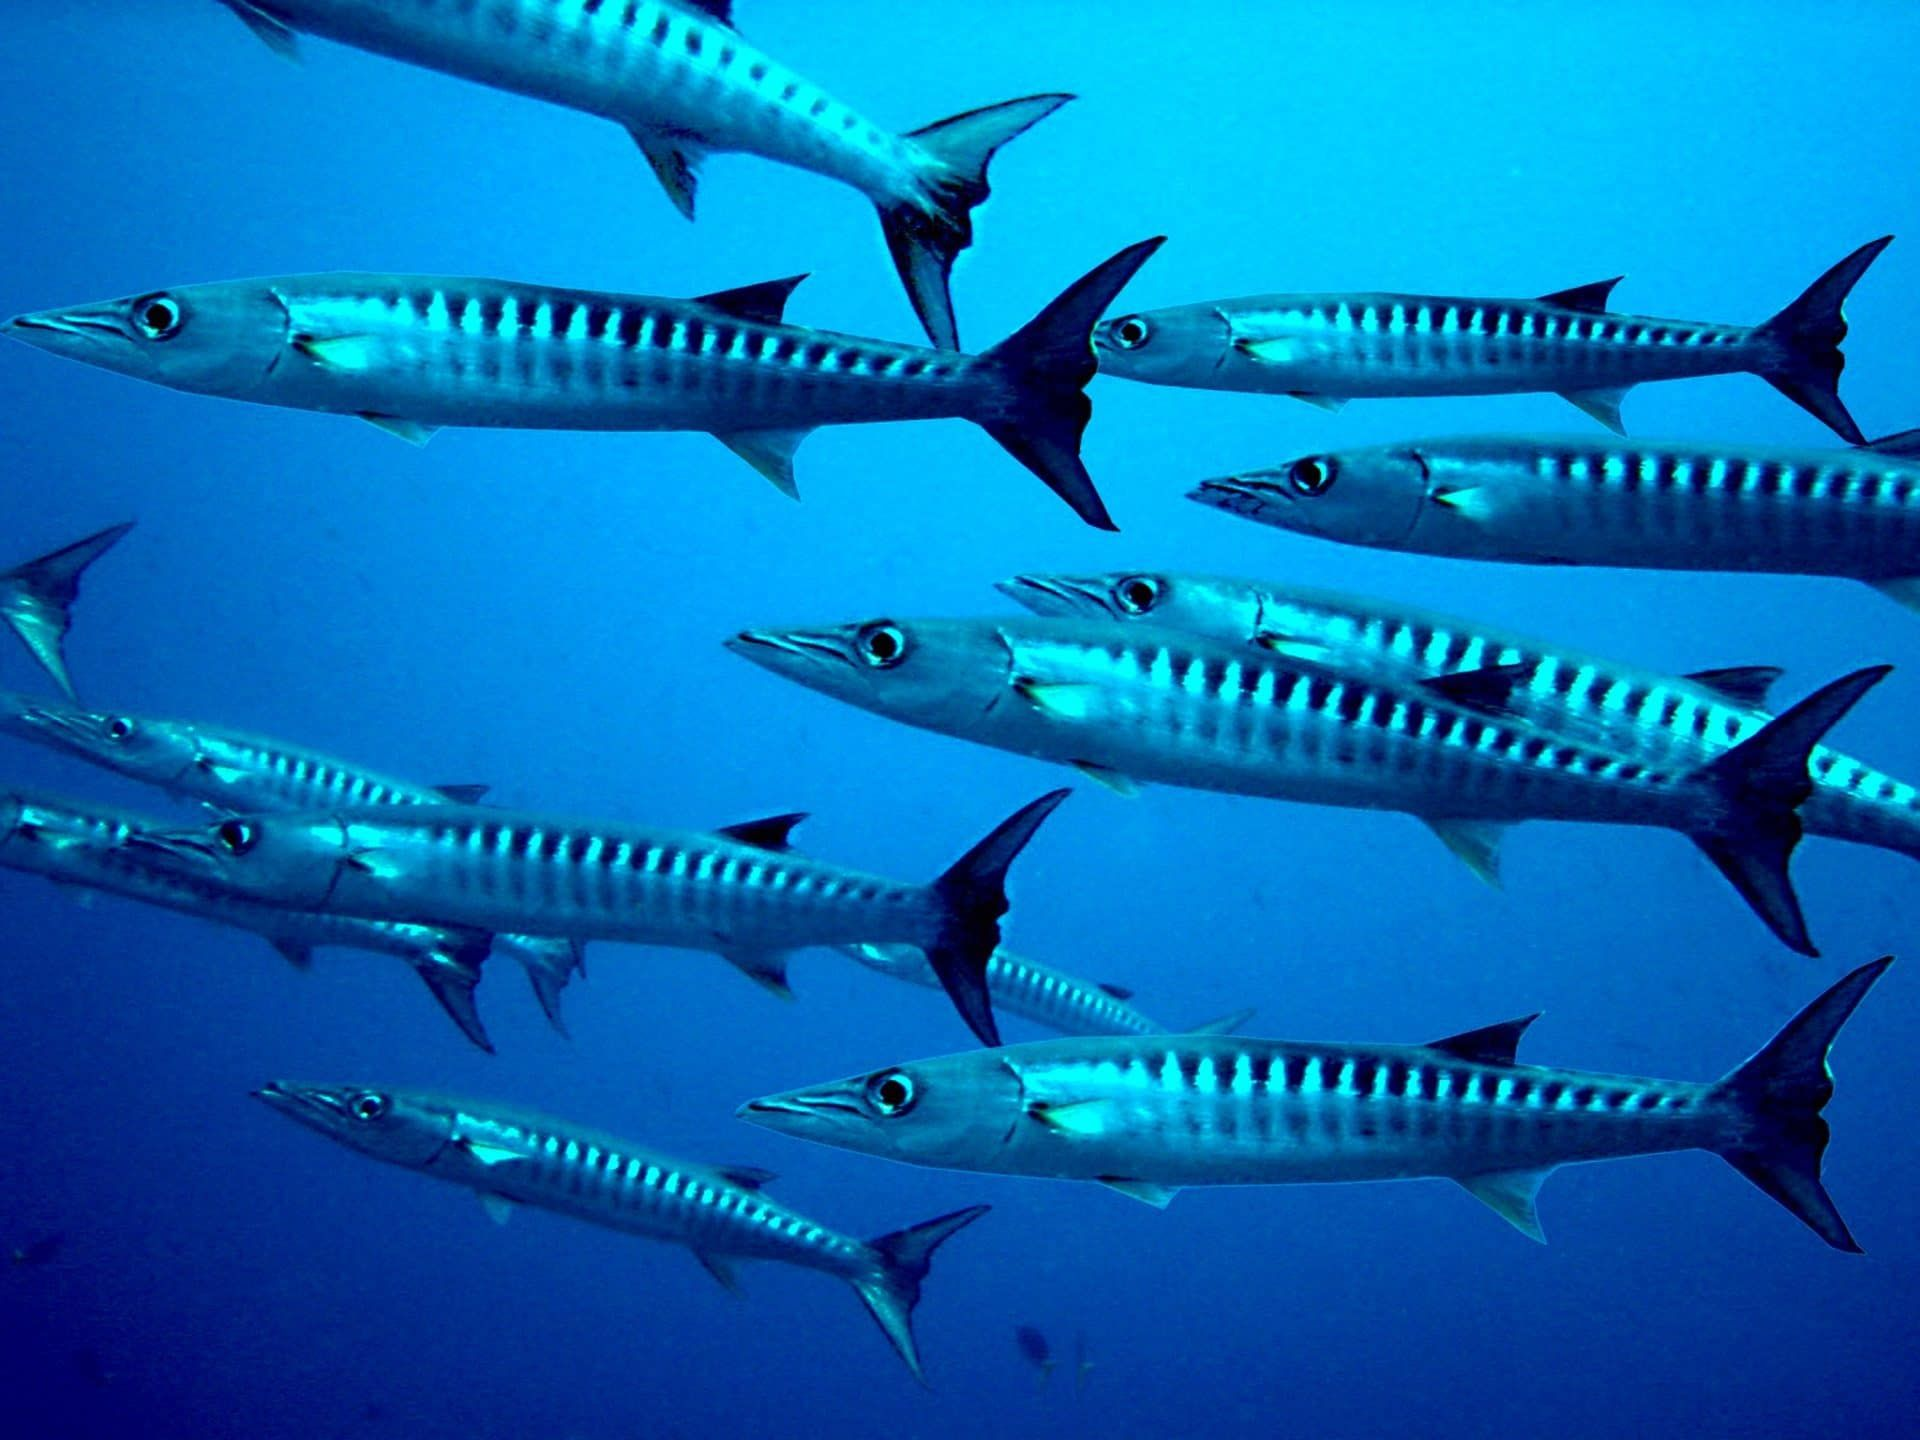 Top 5 Dive Sites In Saba Dutch Caribbean Deeperblue Com In 2020 Marine Ecosystem Sea Life Creatures Animals